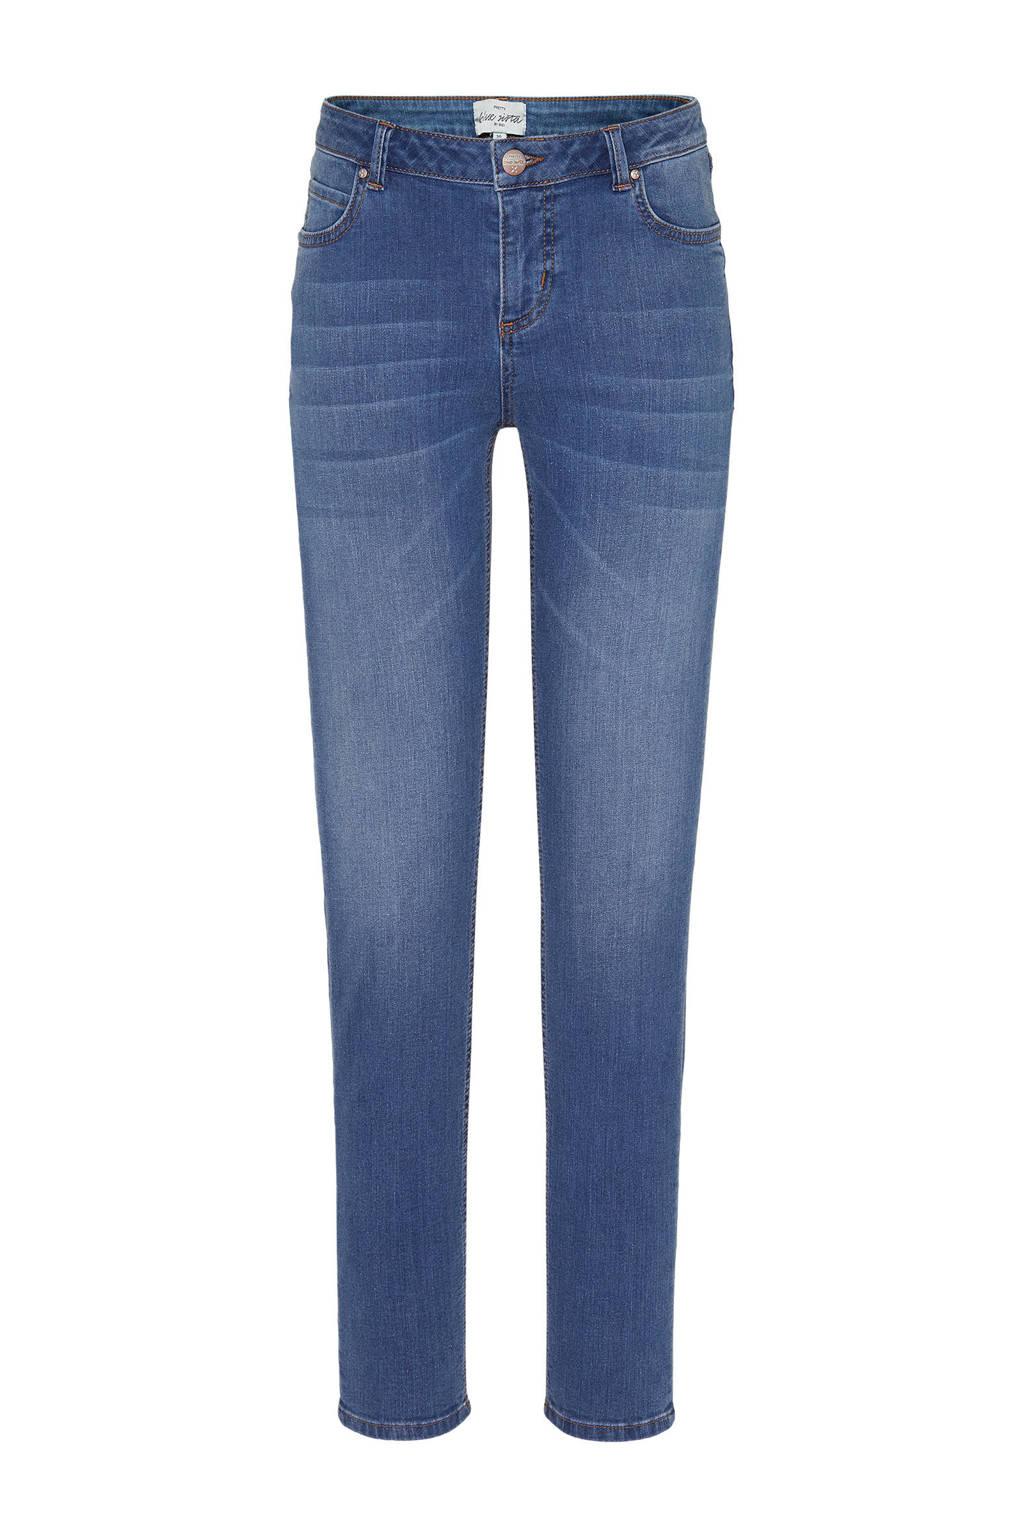 Didi high waist skinny jeans, Light denim